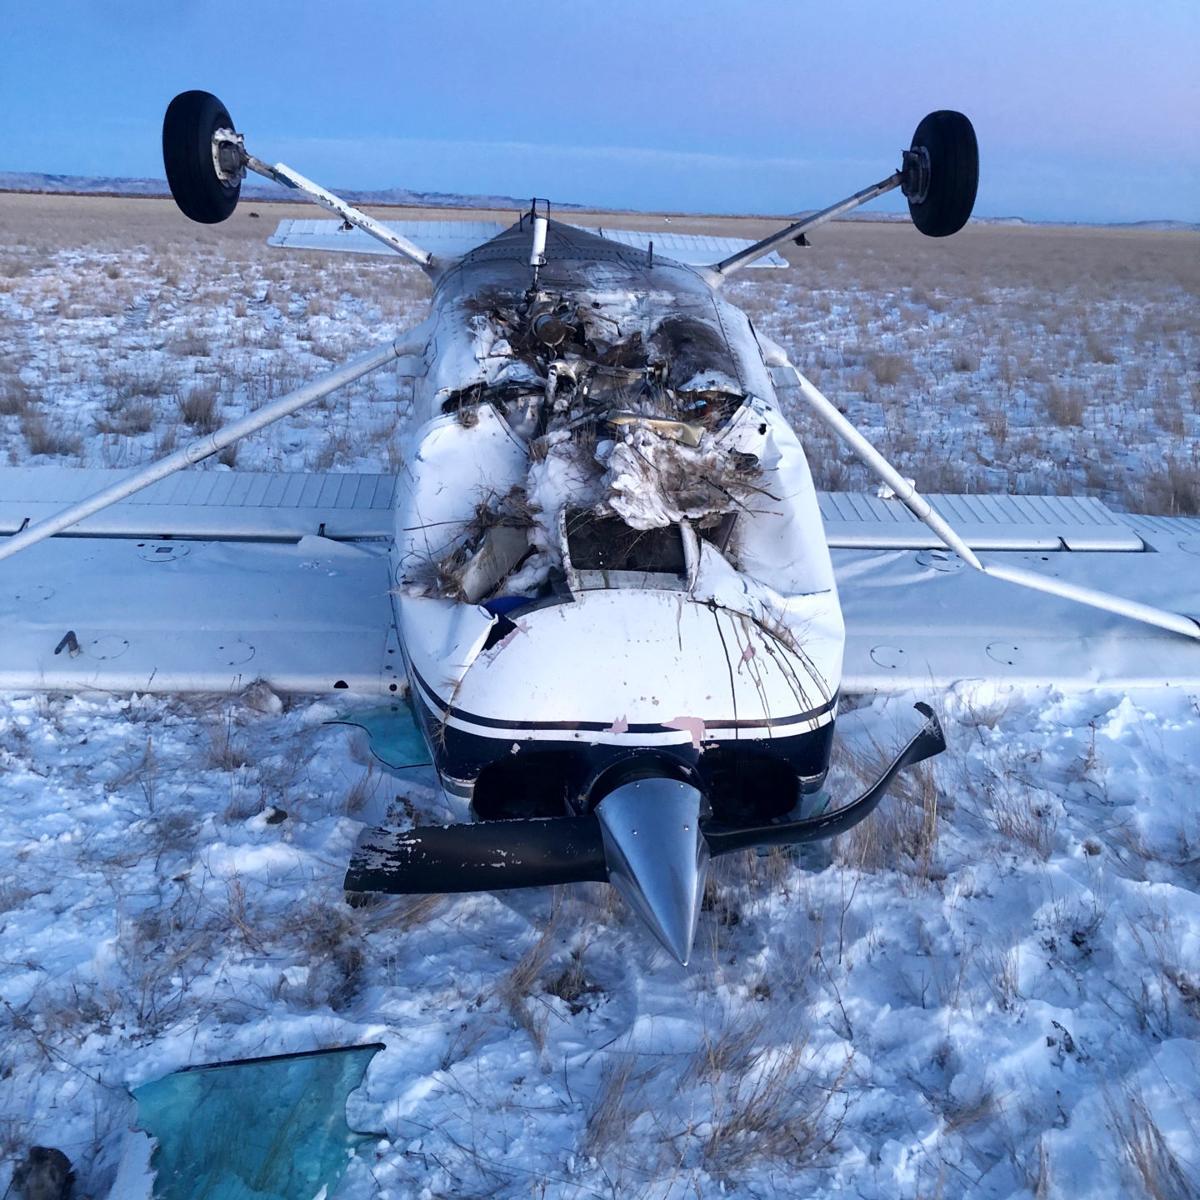 Big Timber plane crash